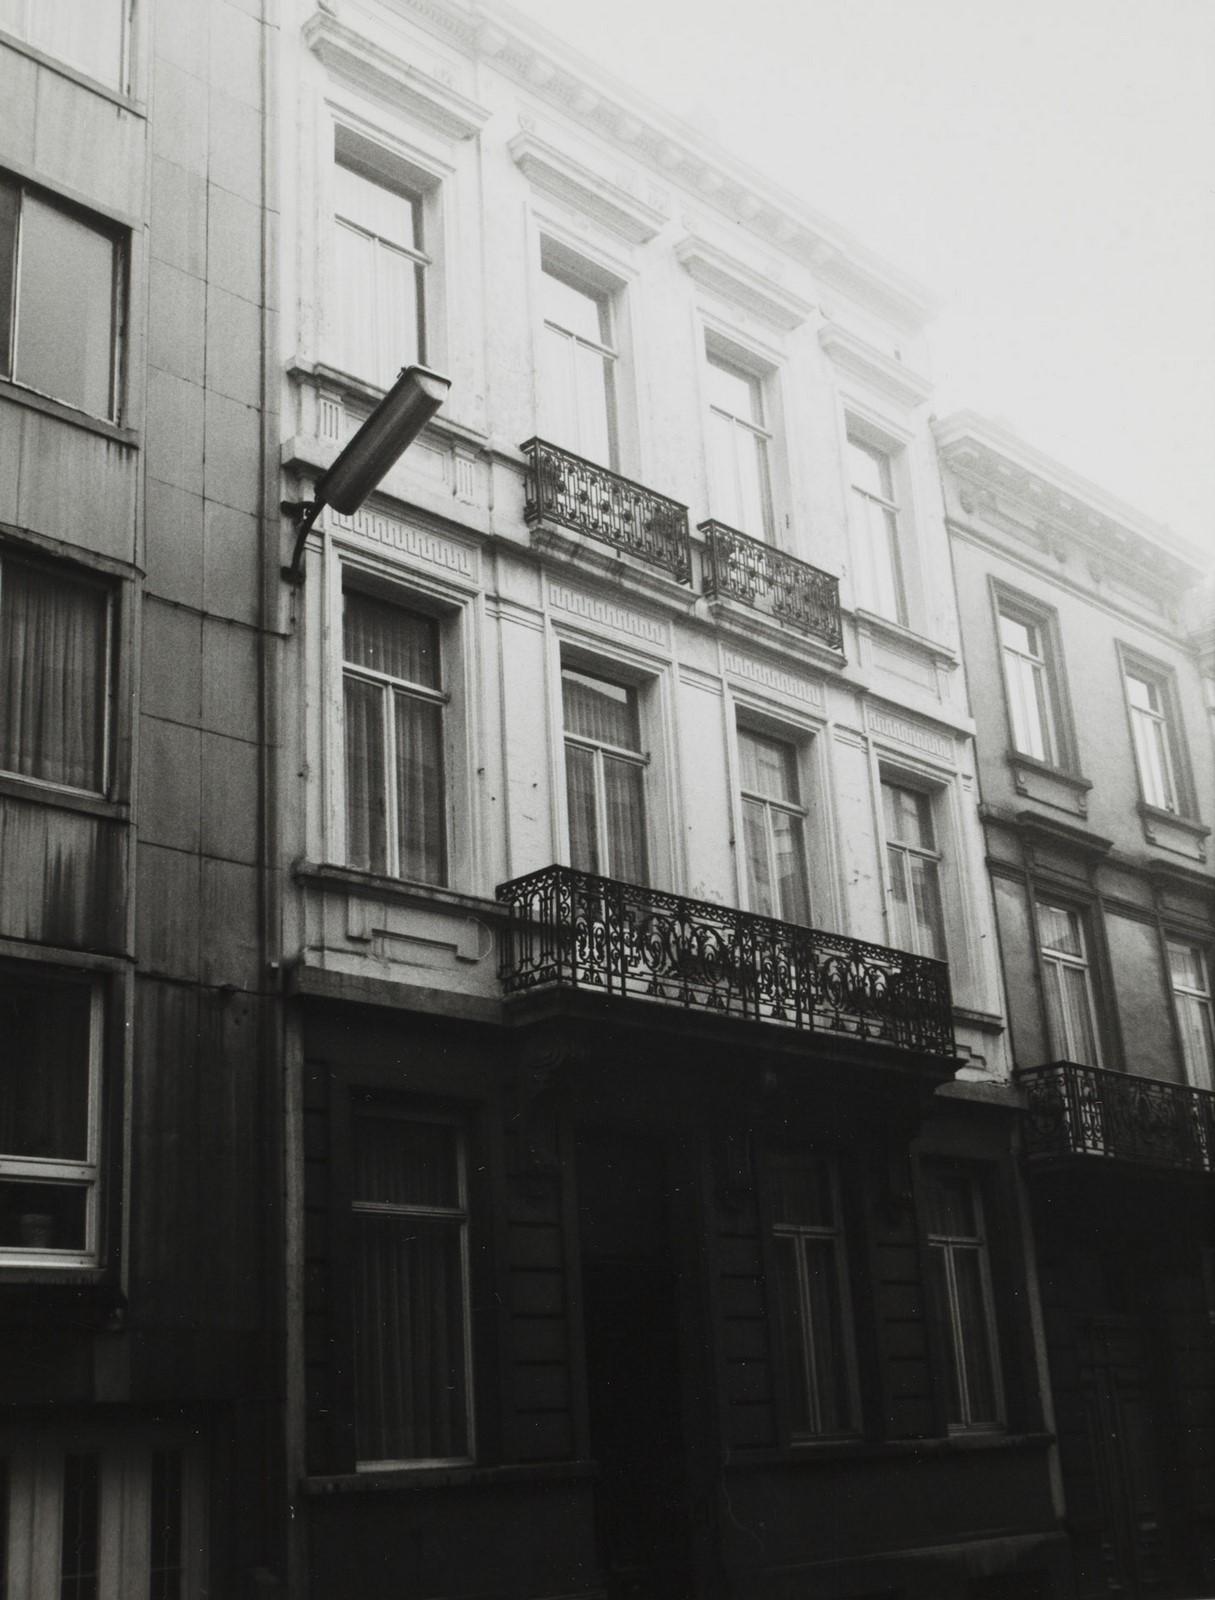 rue de la Révolution 7., 1985